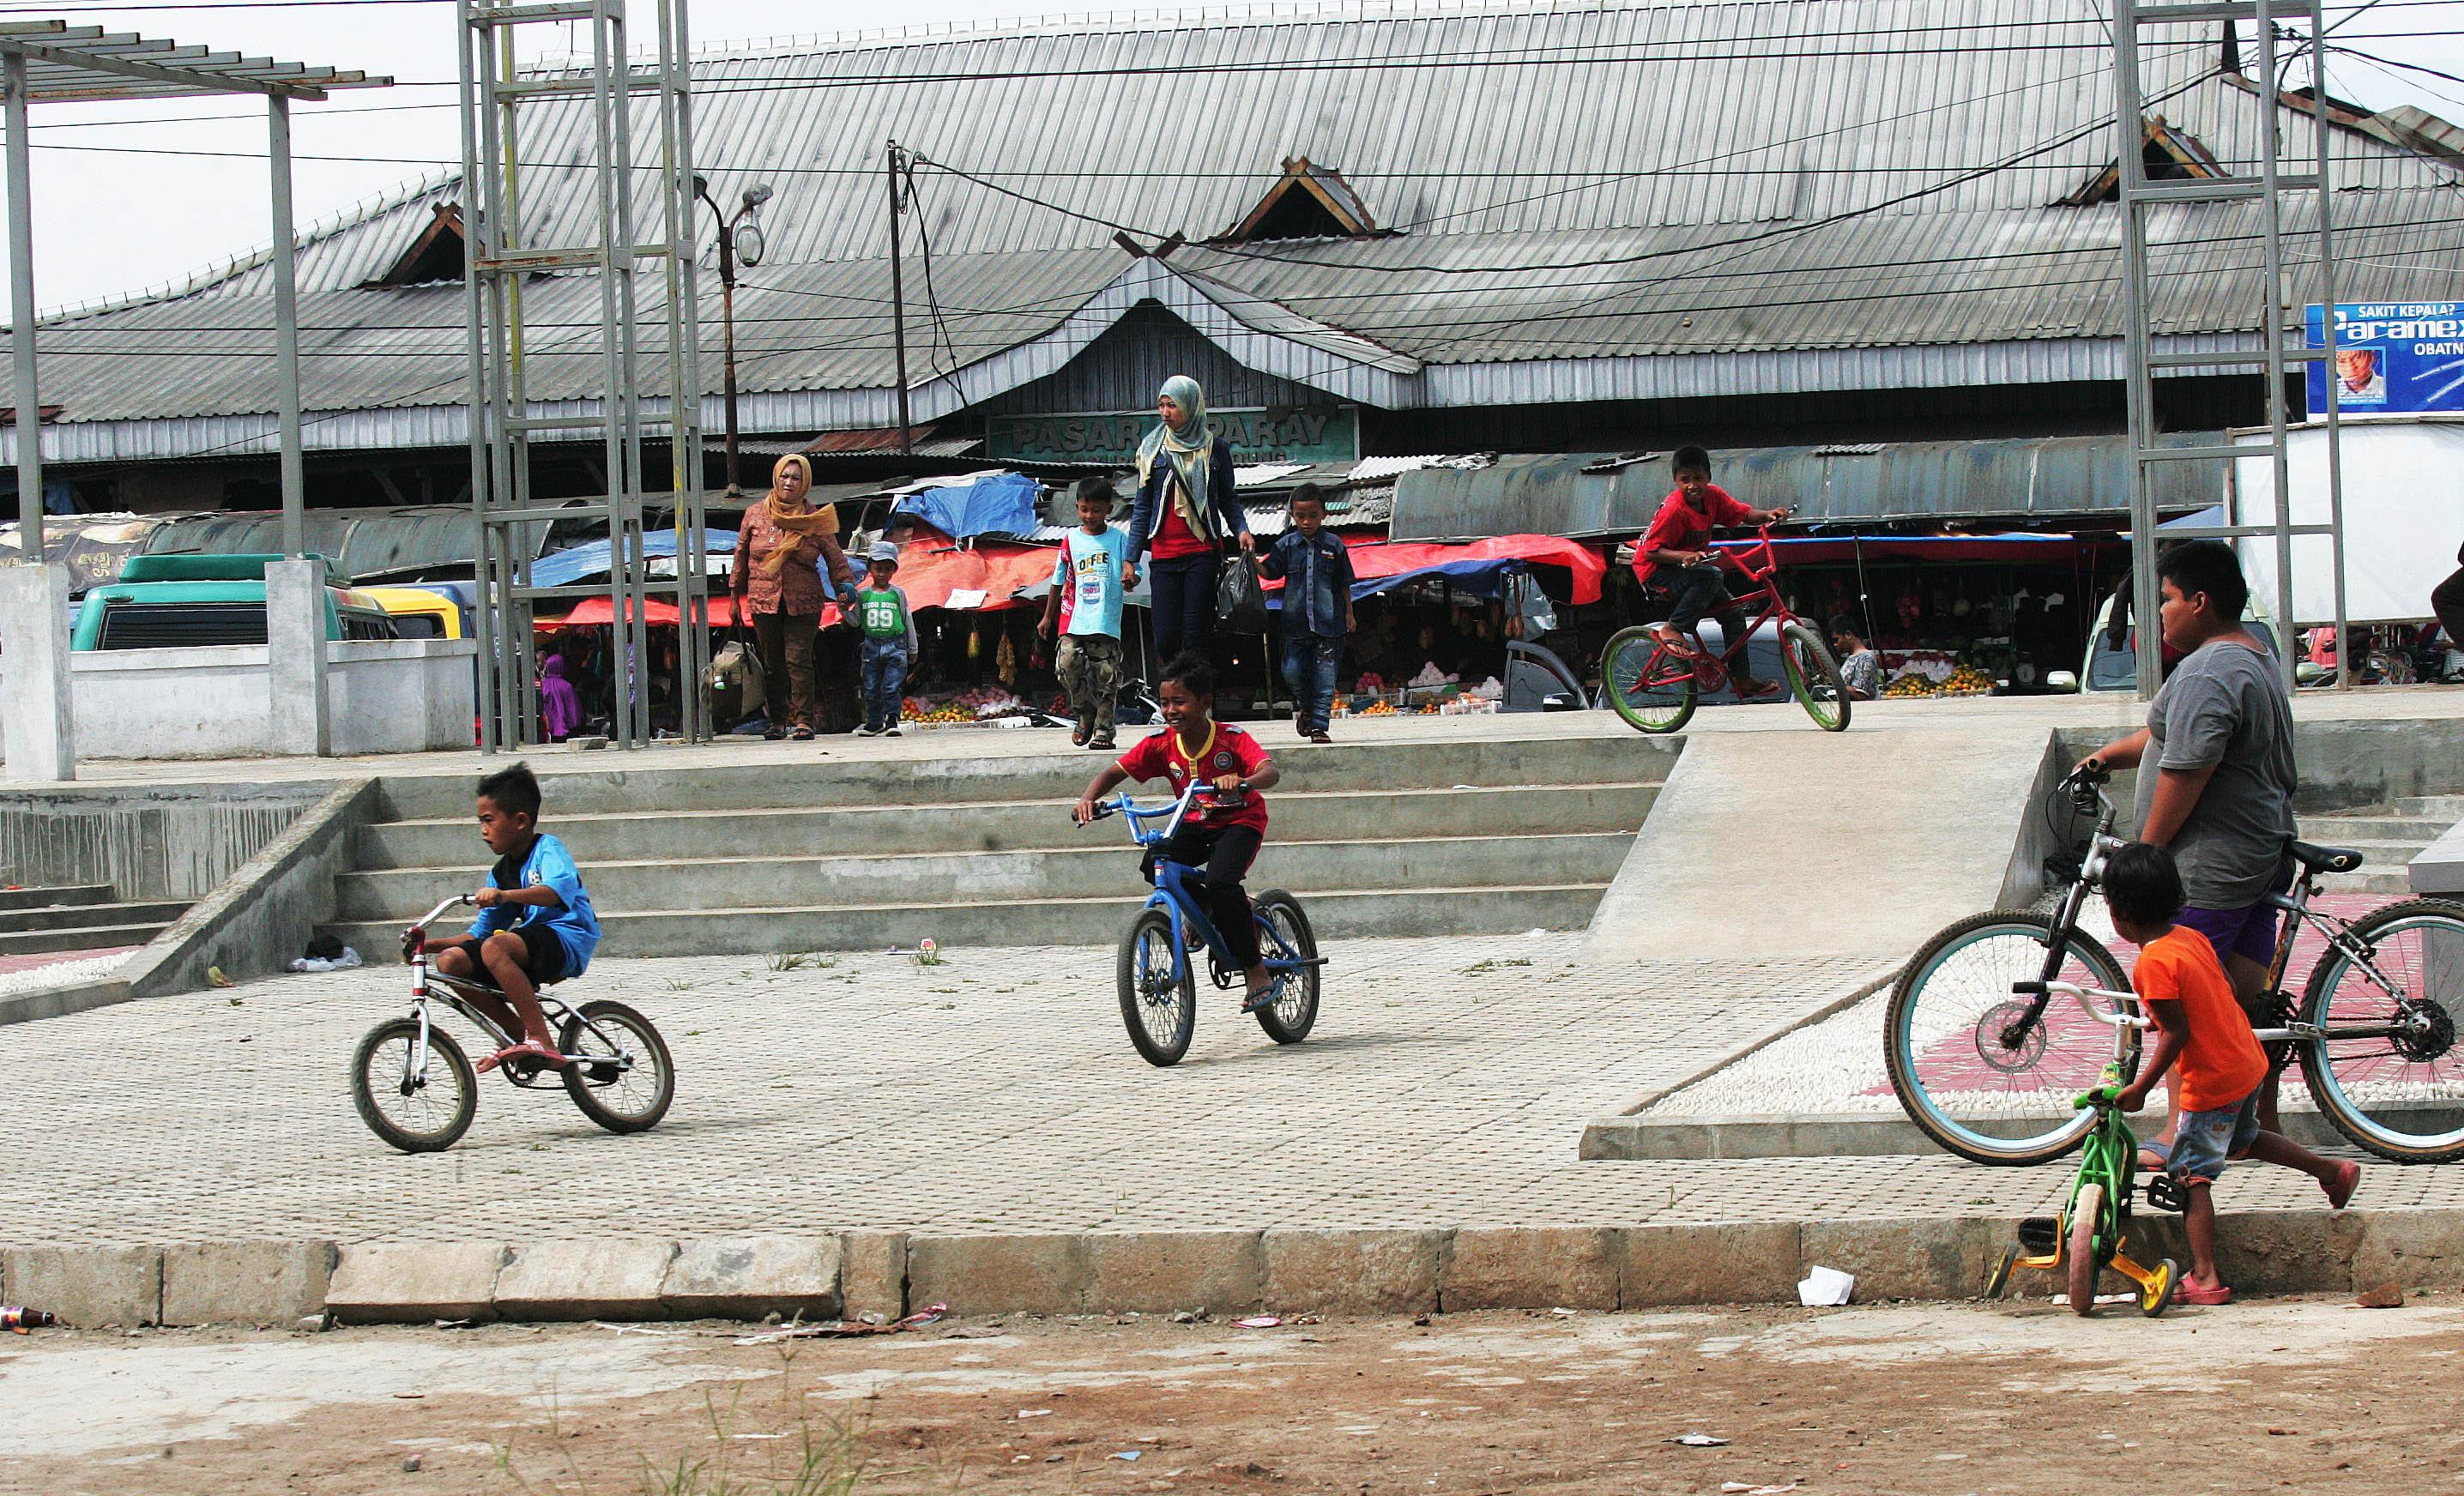 Proyek Taman Kota Ciparay Selesai Pikiran Rakyat Nandang Sukanda Prlm